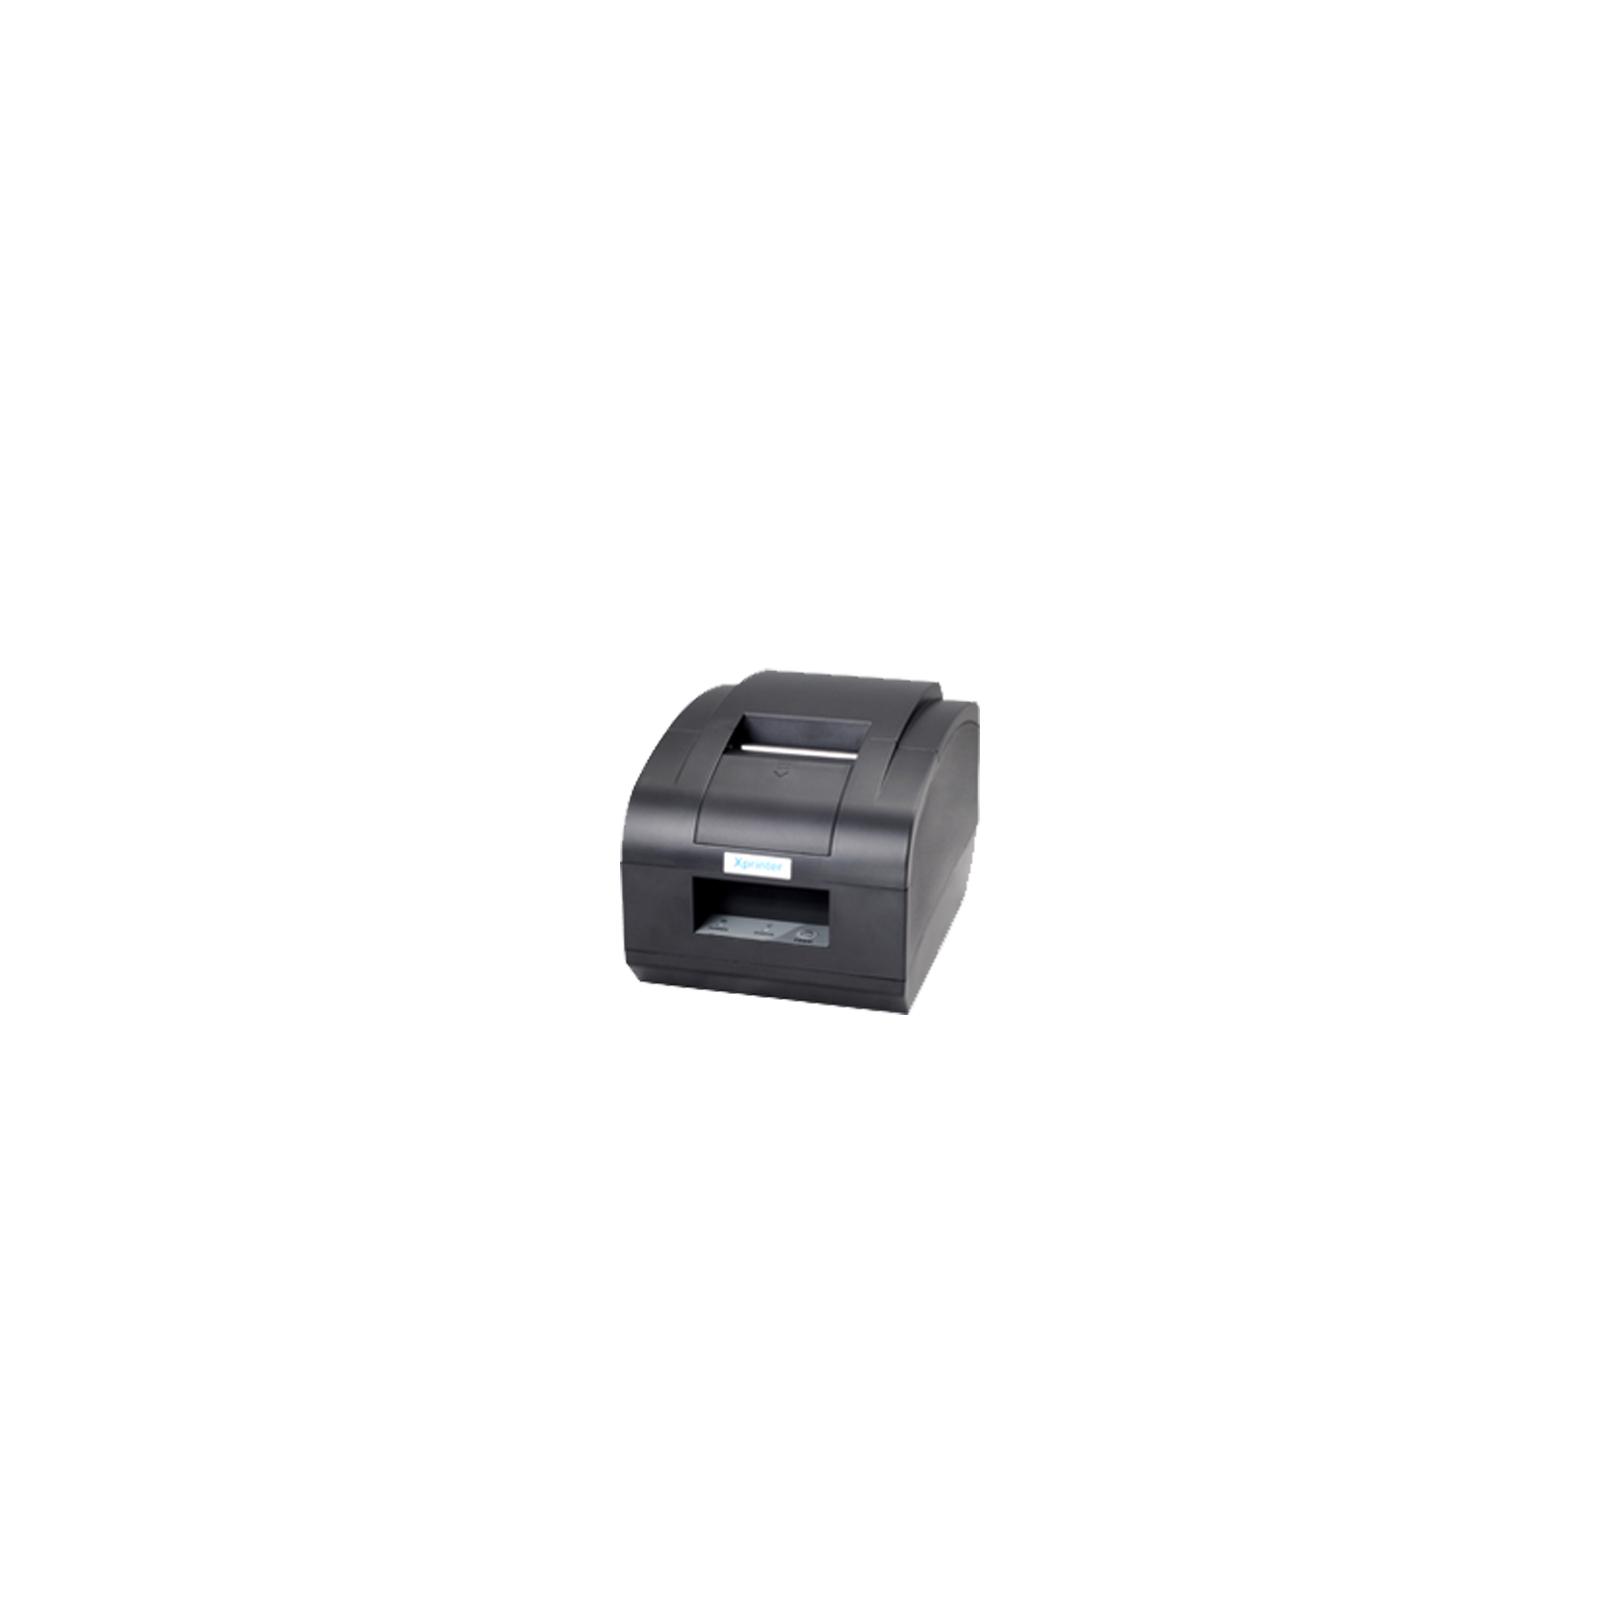 Принтер чеков X-PRINTER XP-T58NC USB